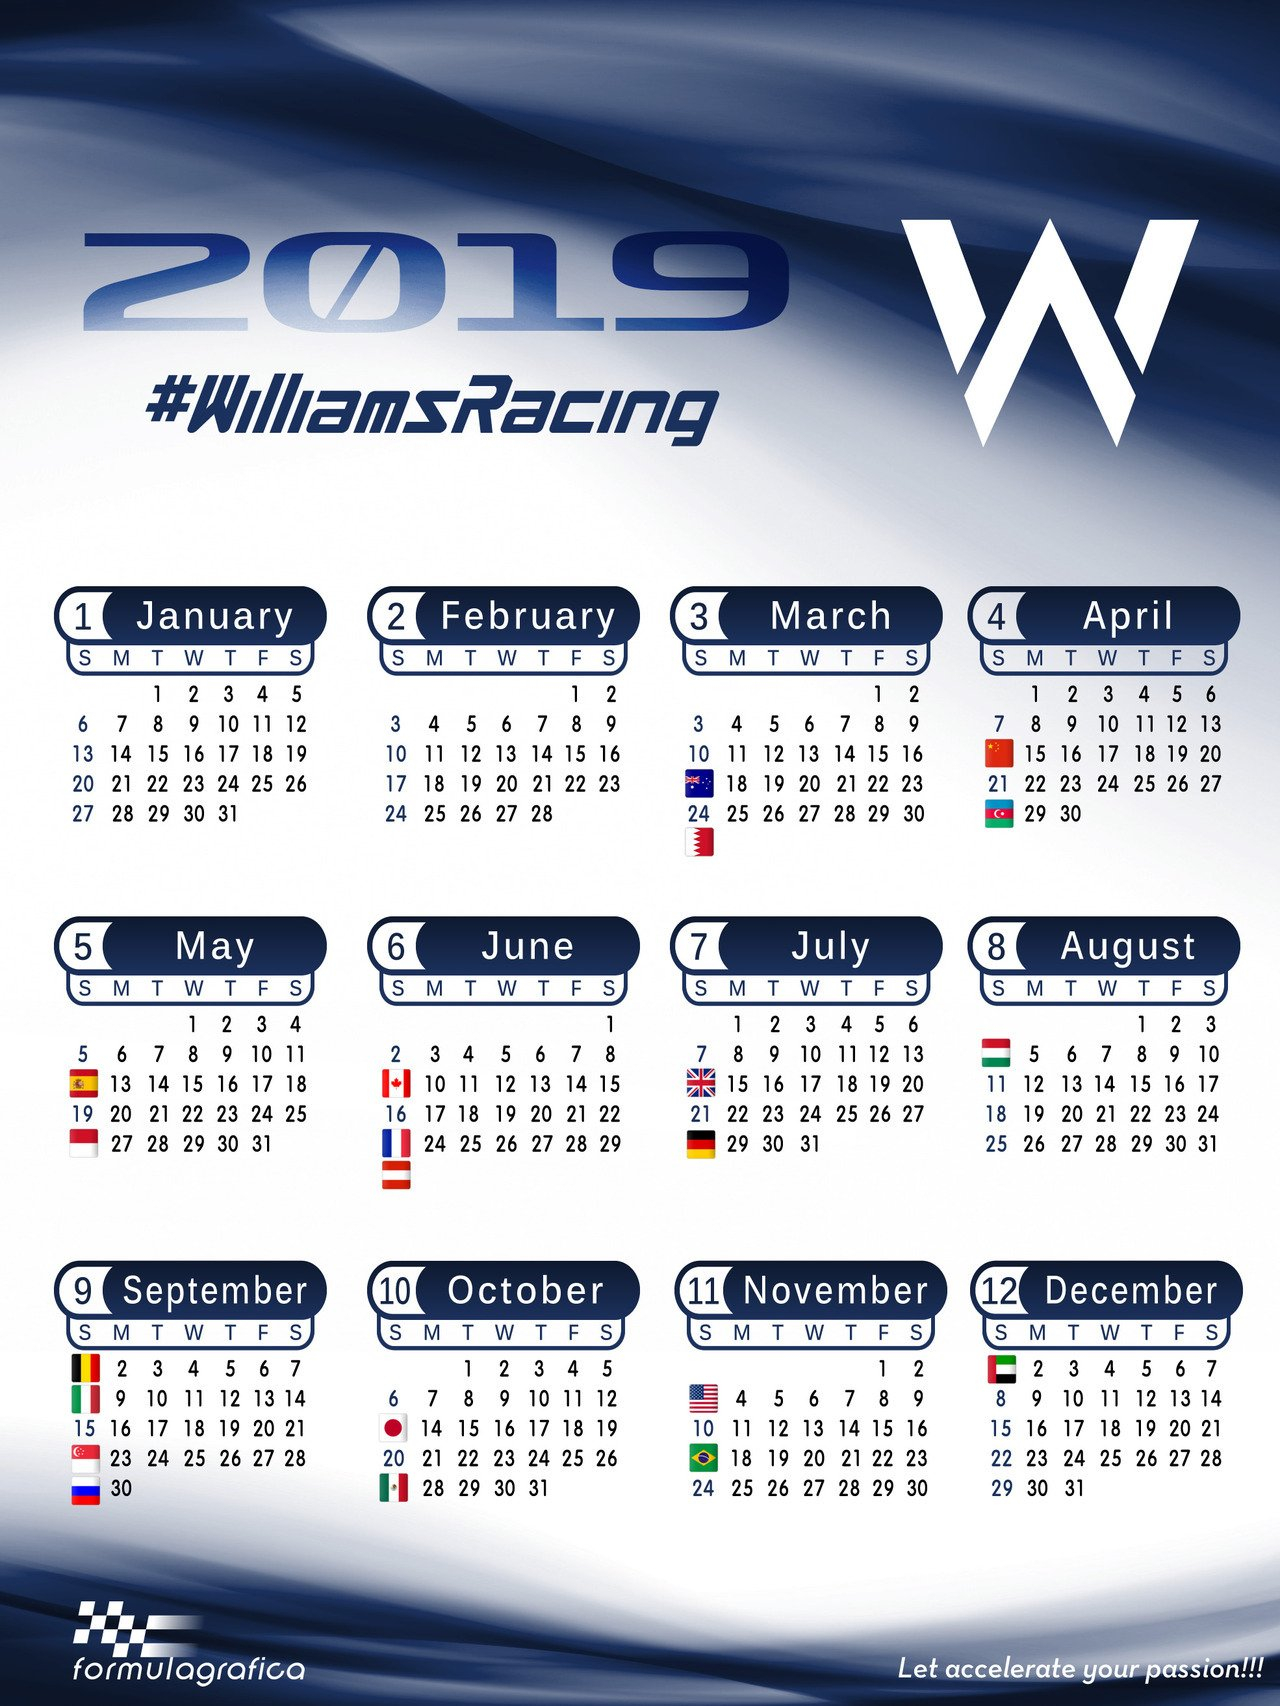 Formulagrafica — Calendar – 2019 Formula 1 Season – Williams Racing Calendar 2019 Formula 1